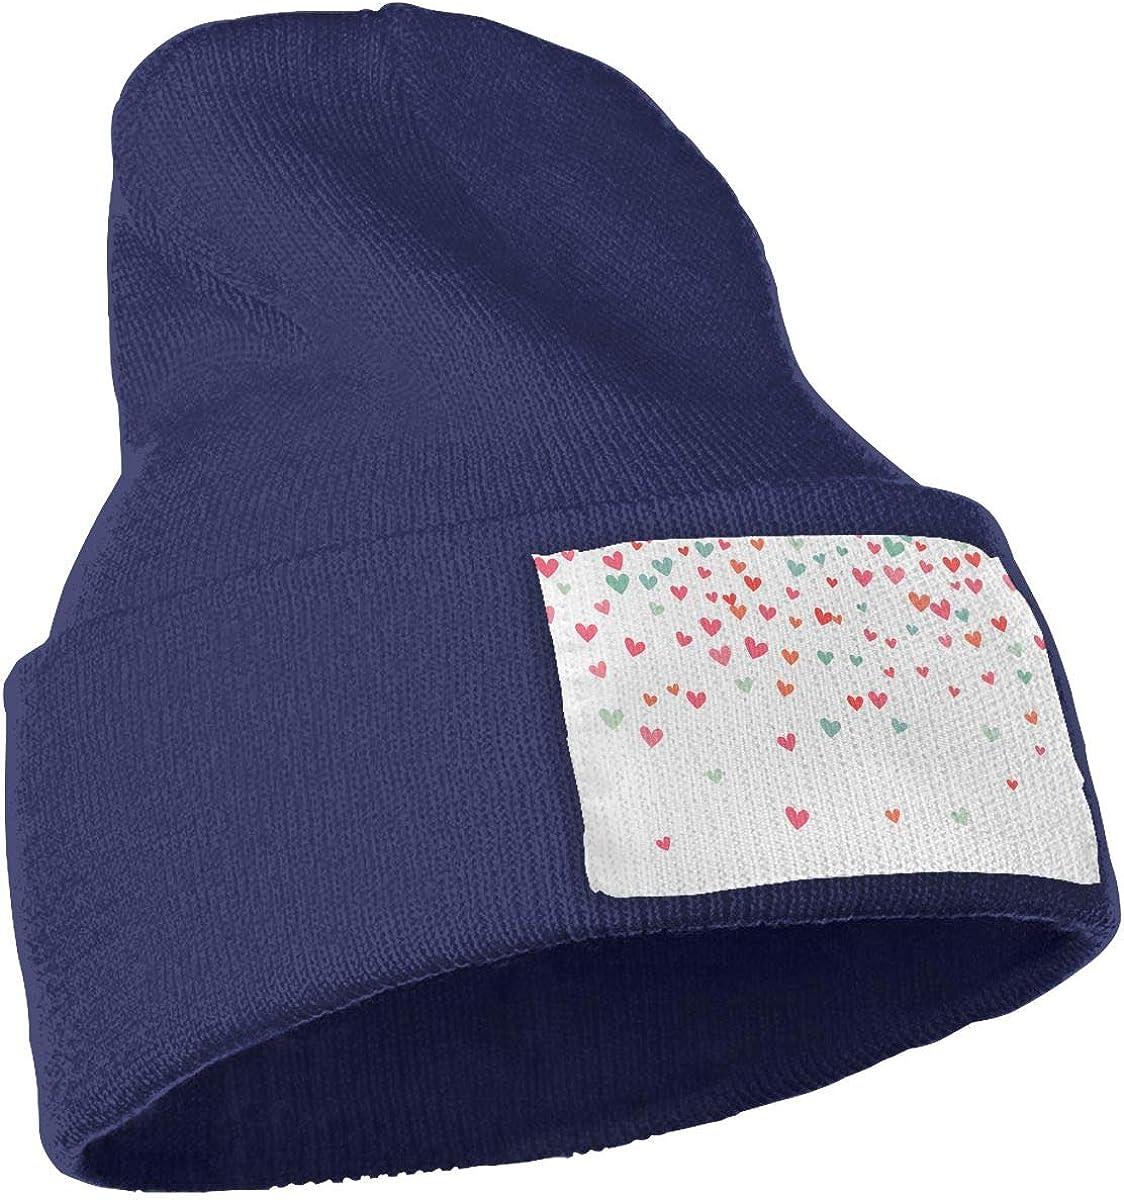 Many Flying Hearts On White Background Unisex Fashion Knitted Hat Luxury Hip-Hop Cap